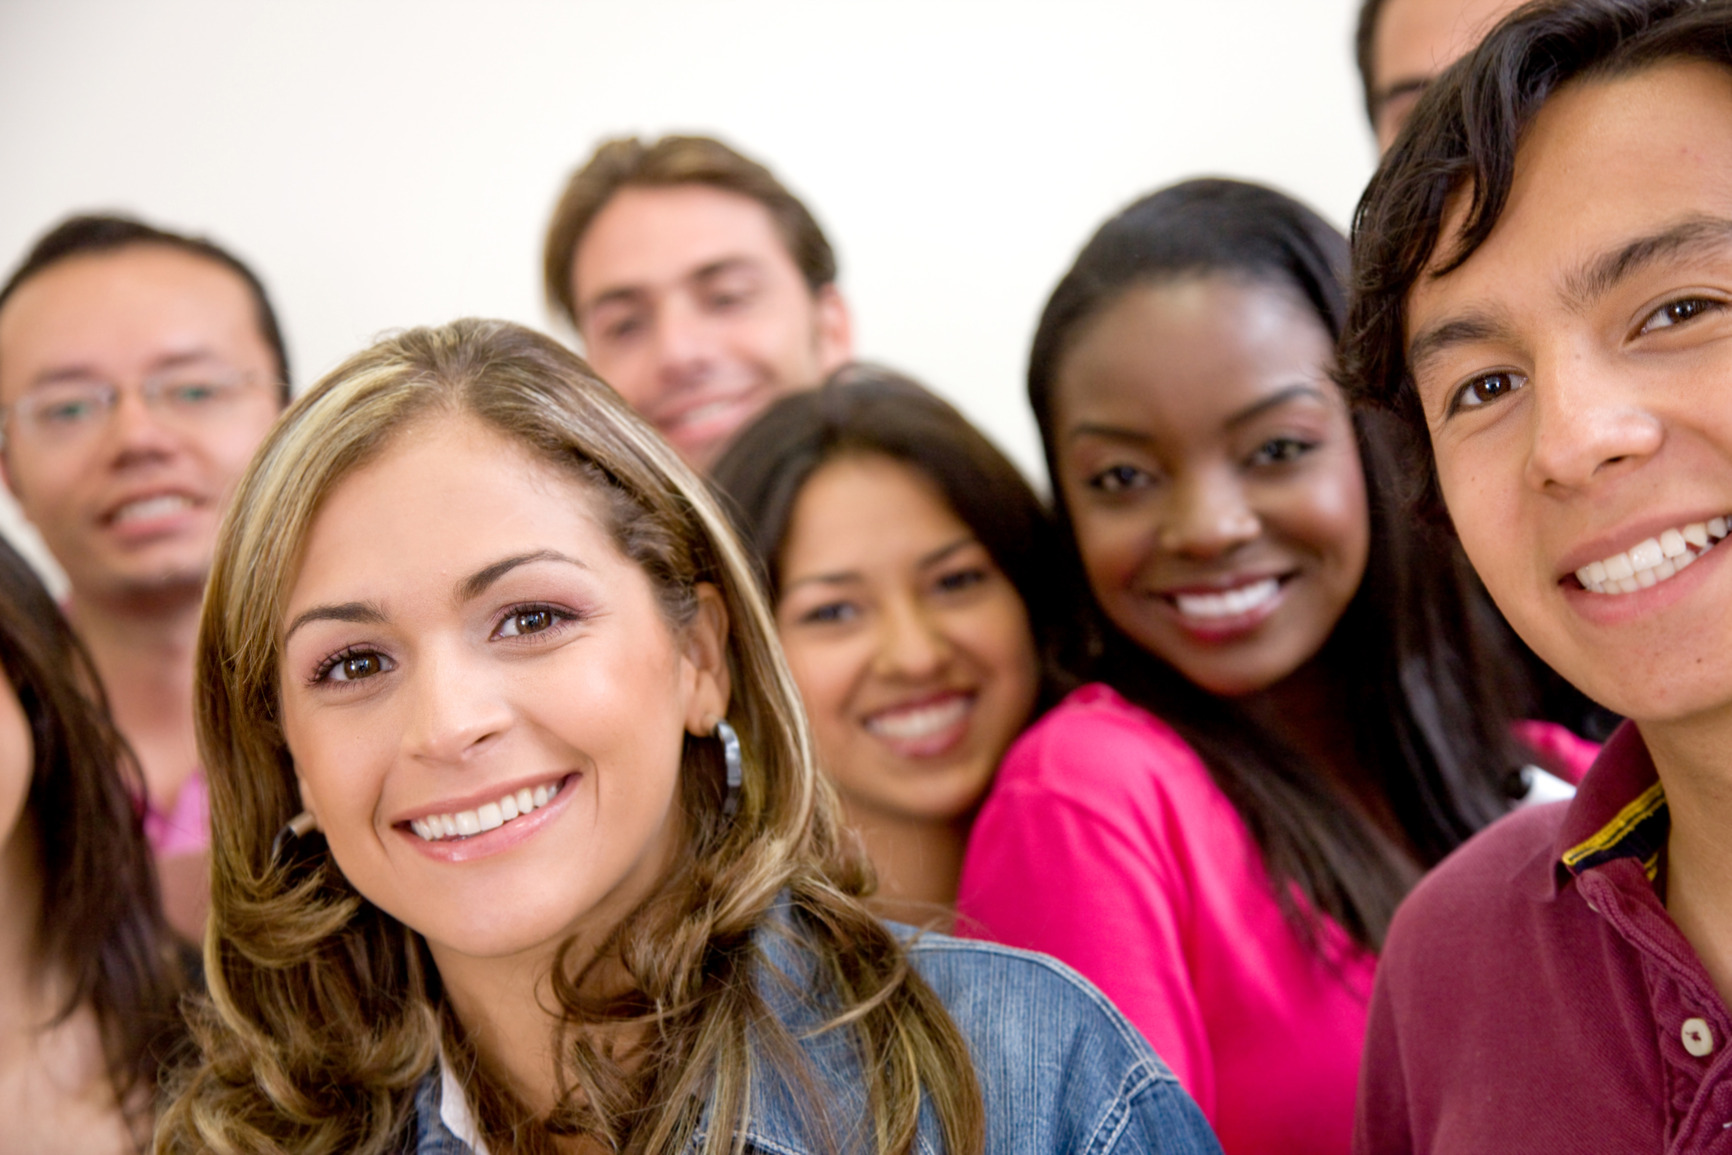 Teaching English opens doors to meeting people around the world. Photo Credit: photodune.